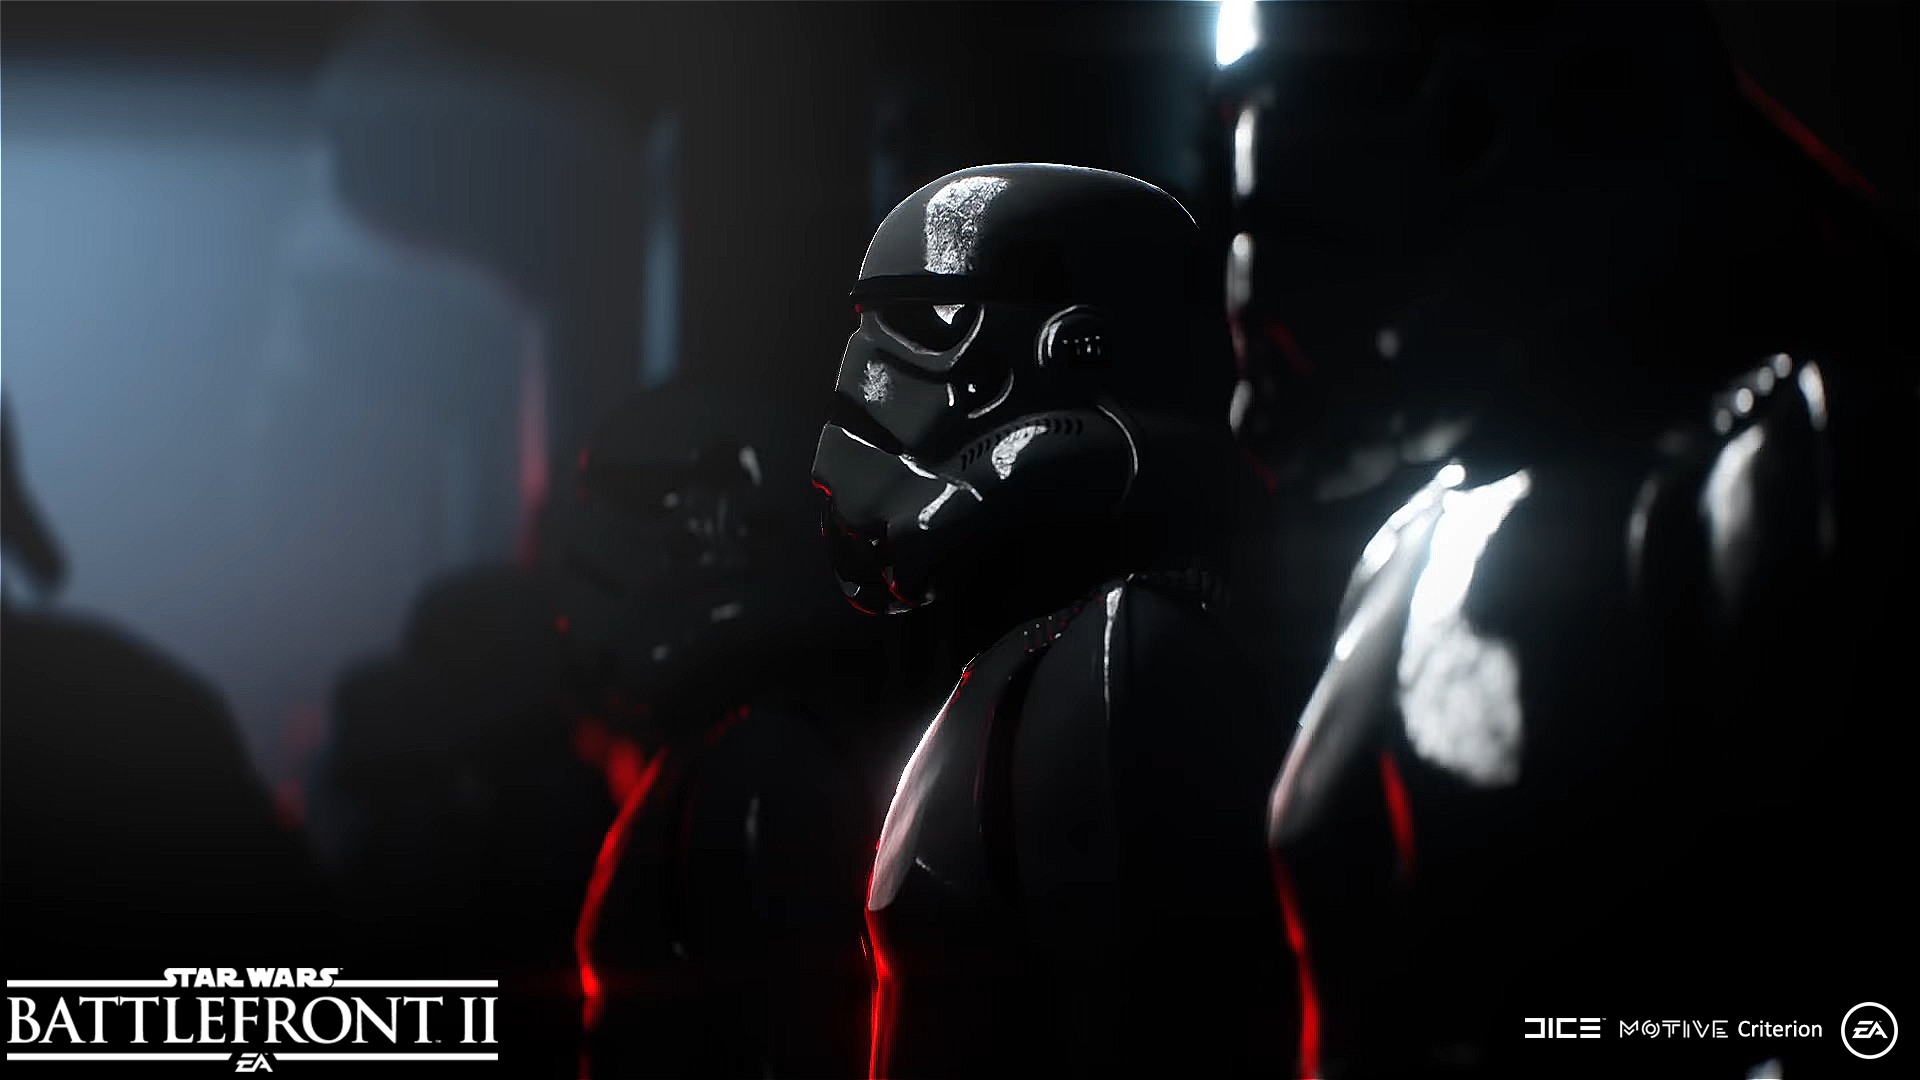 Star Wars Battlefront Ii Wallpaper Stormtrooper By